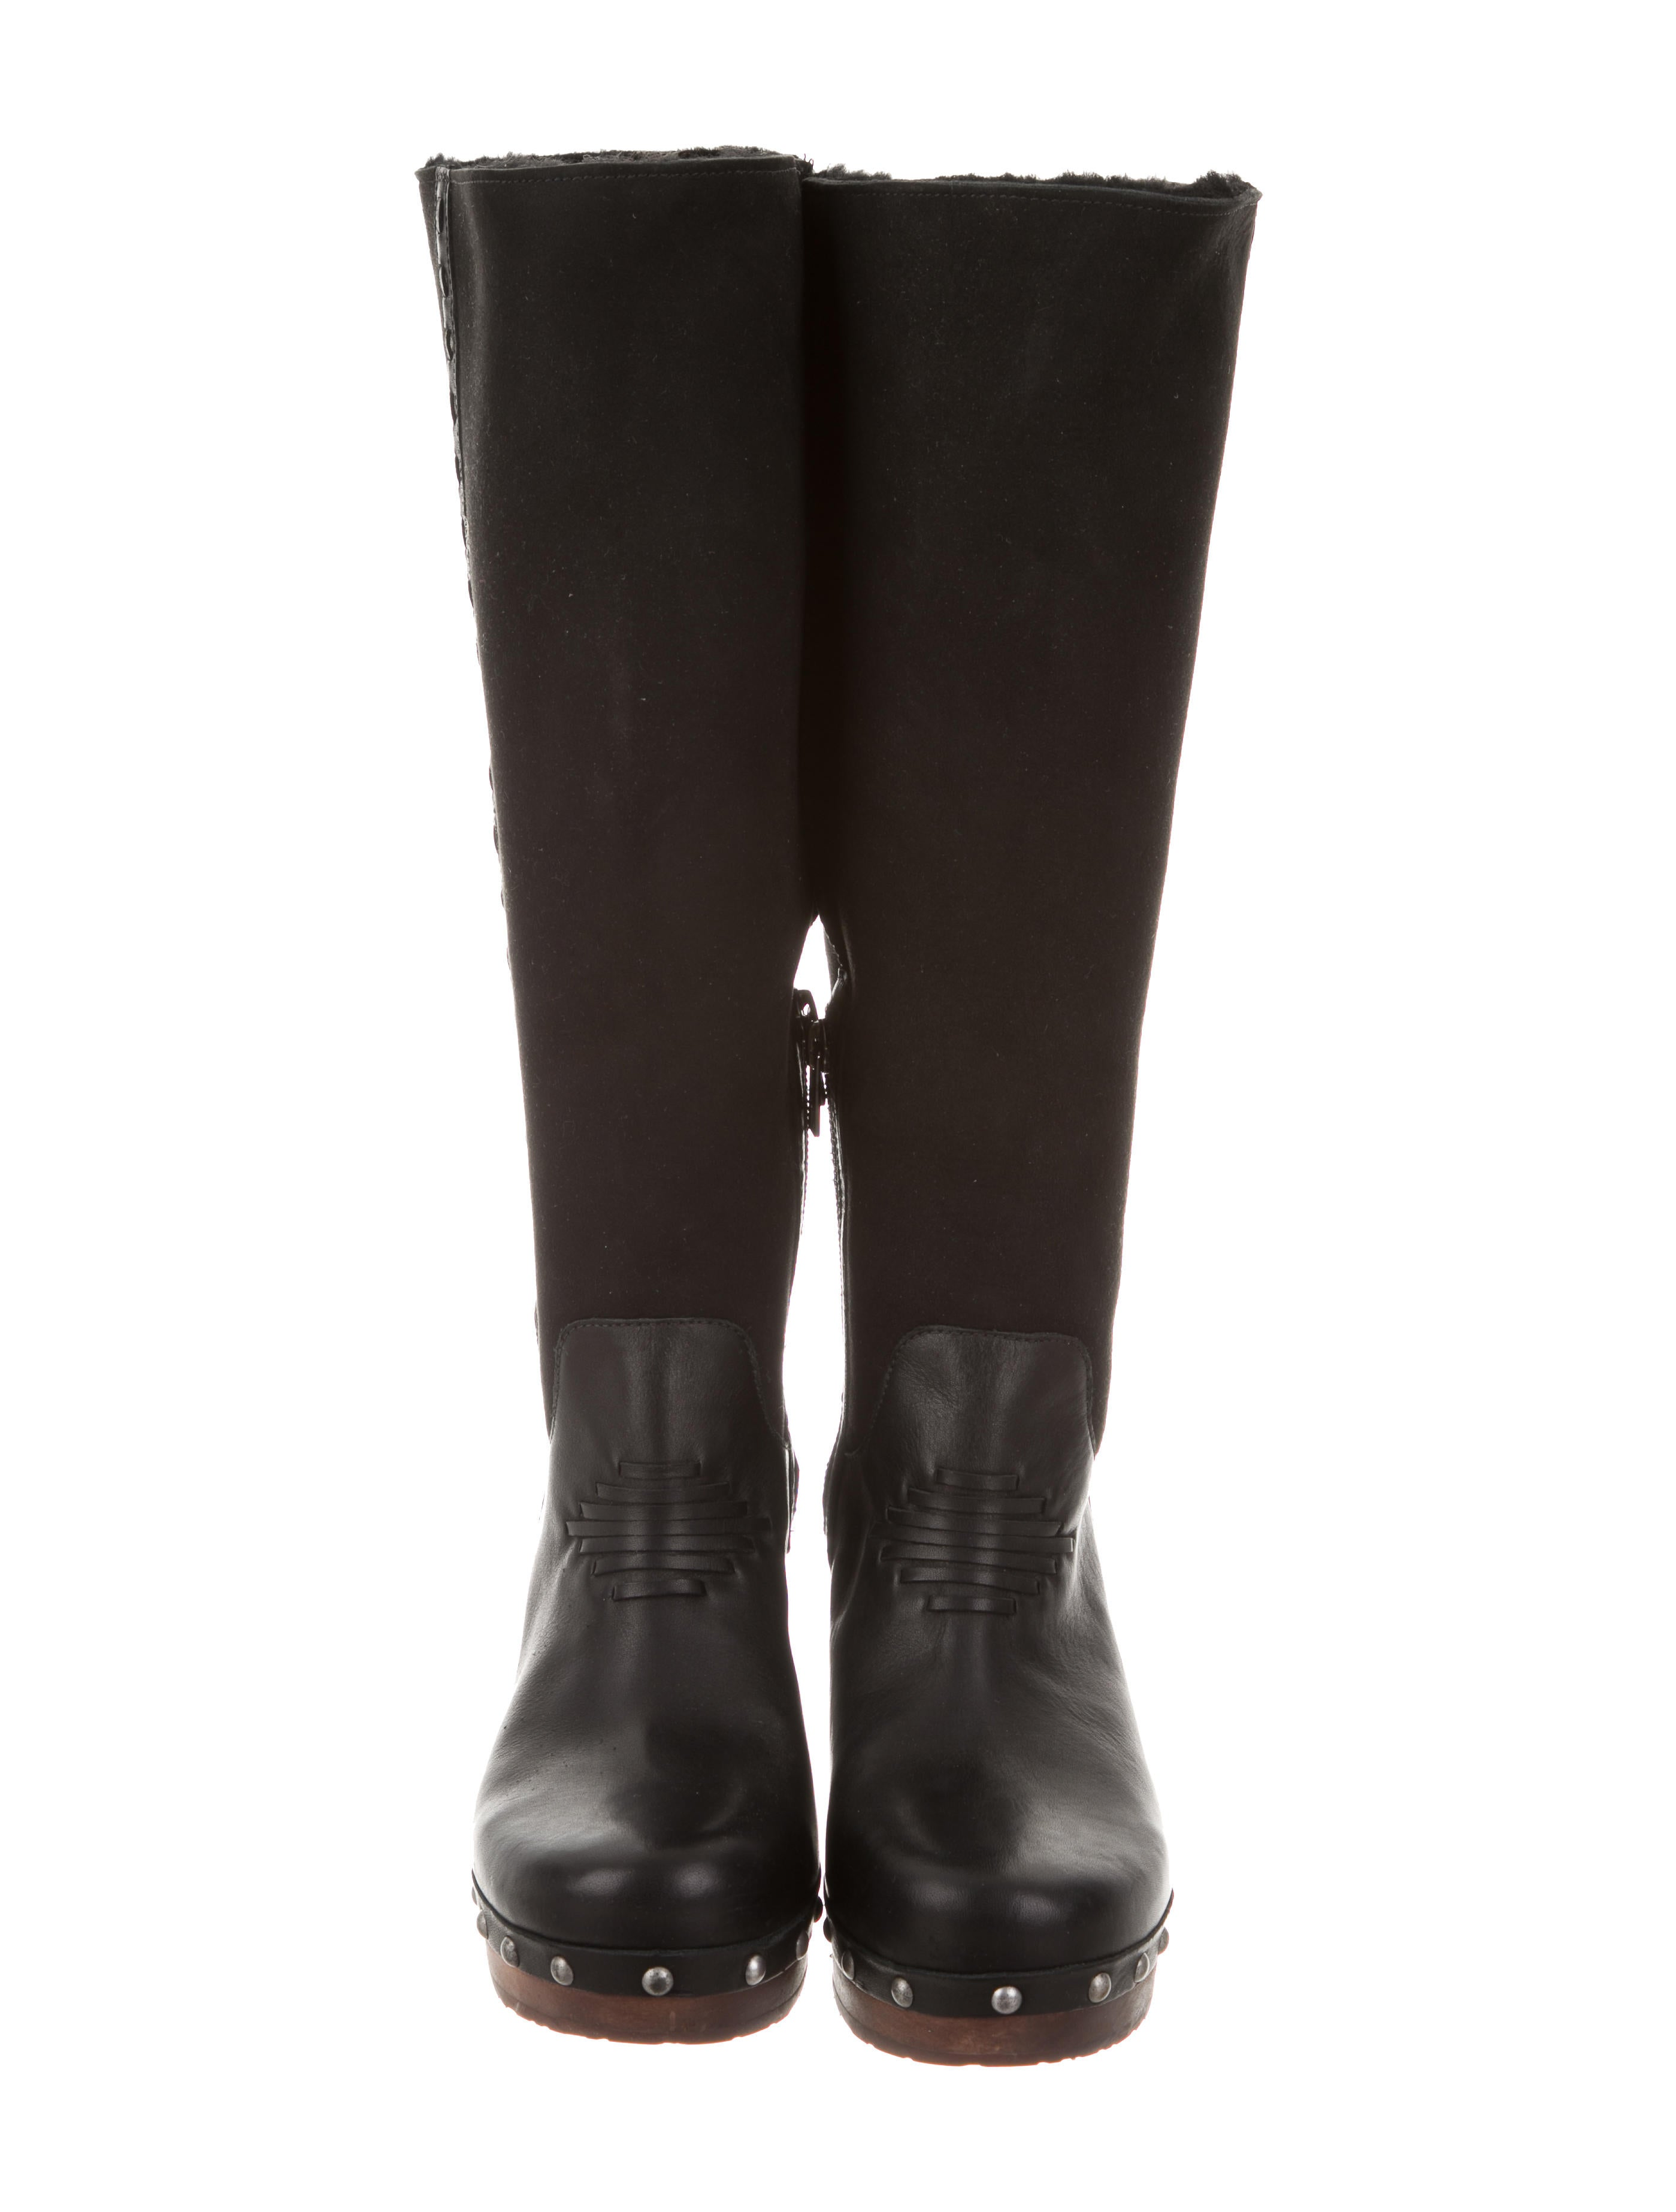 ugg australia platform knee high boots shoes